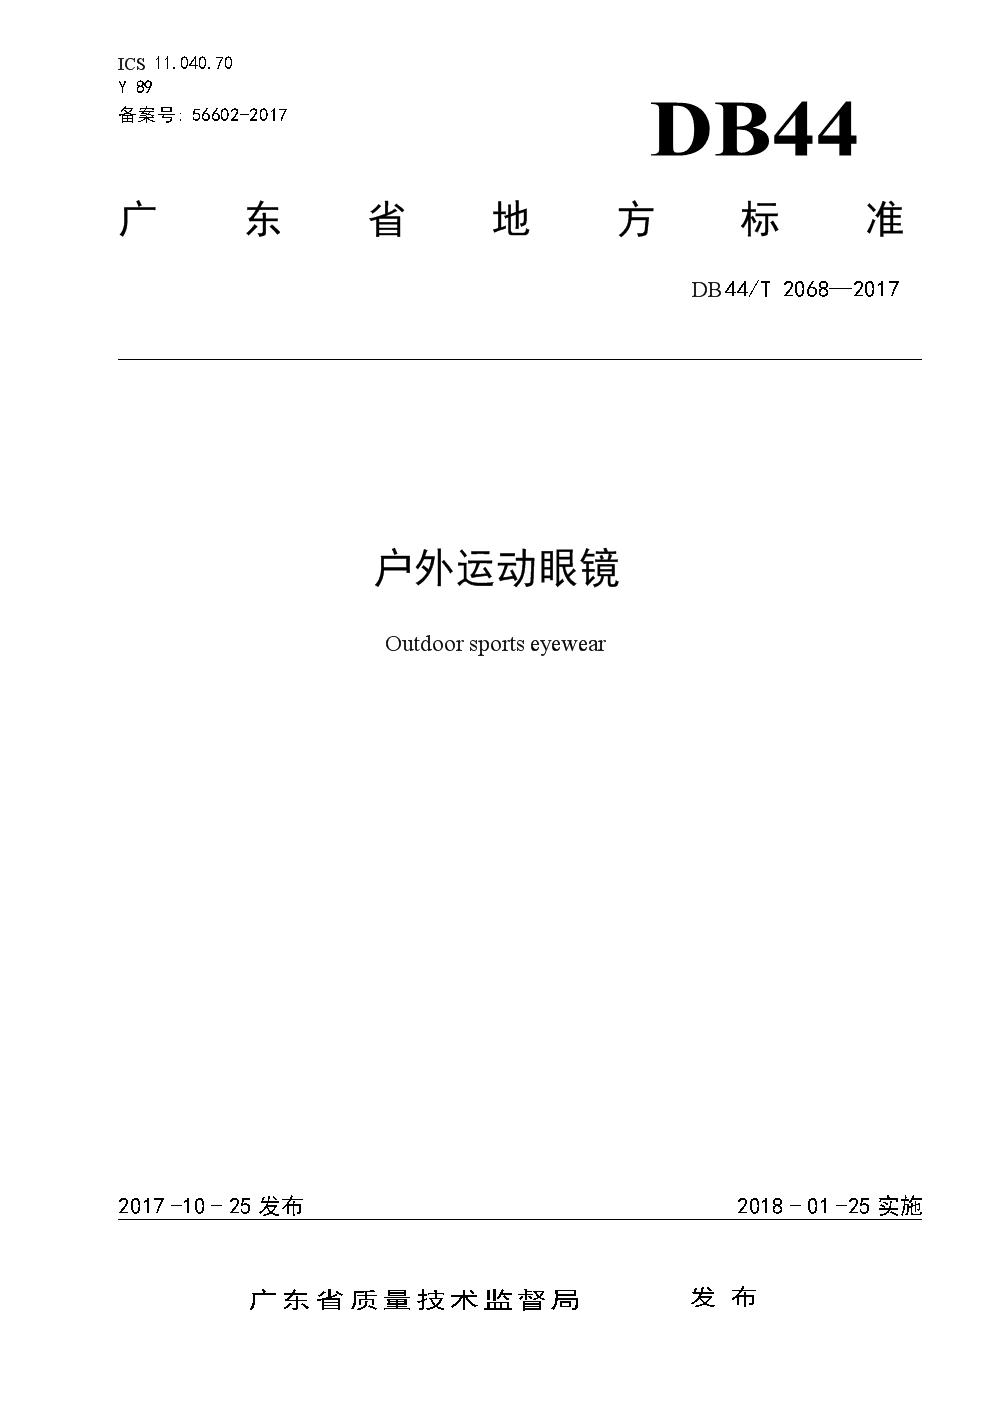 DB44∕T 2068-2017 户外运动眼镜.docx